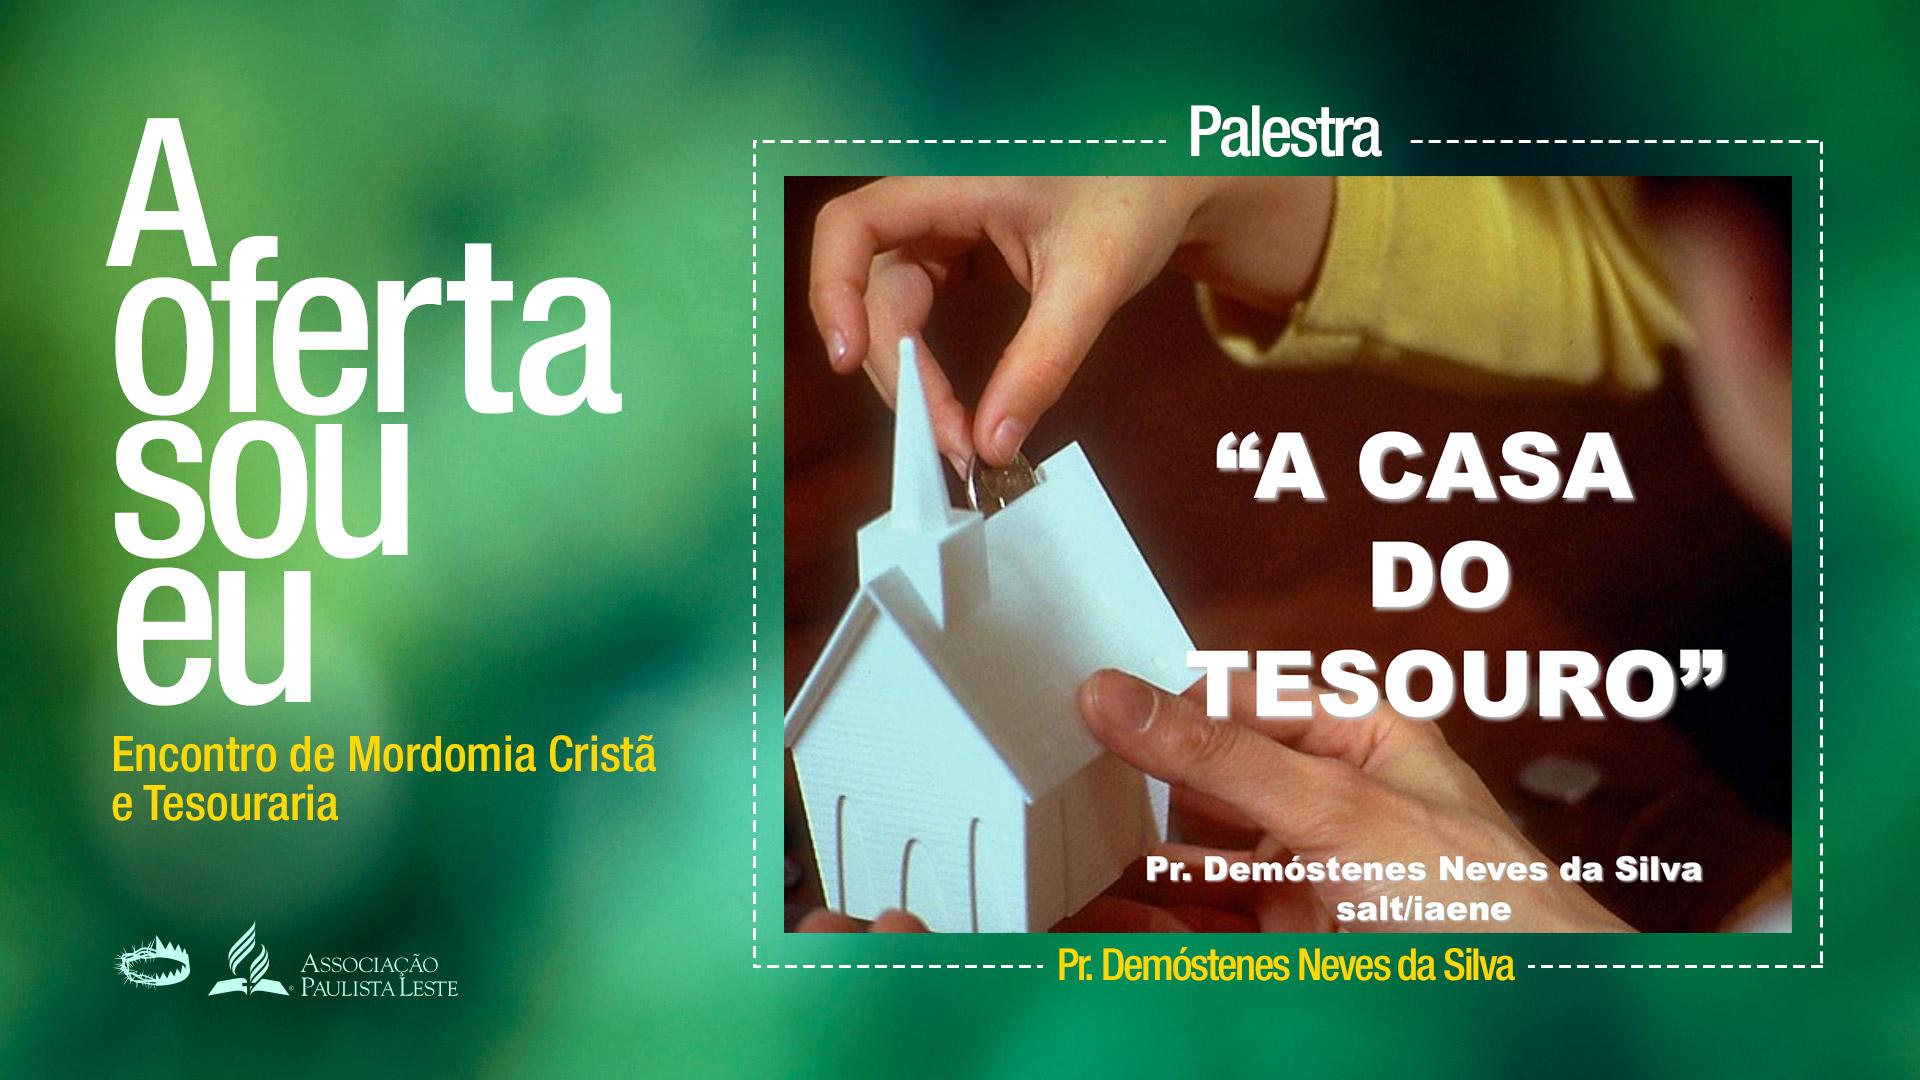 (PPT) A casa do tesouro – Pr. Demóstenes Neves da Silva